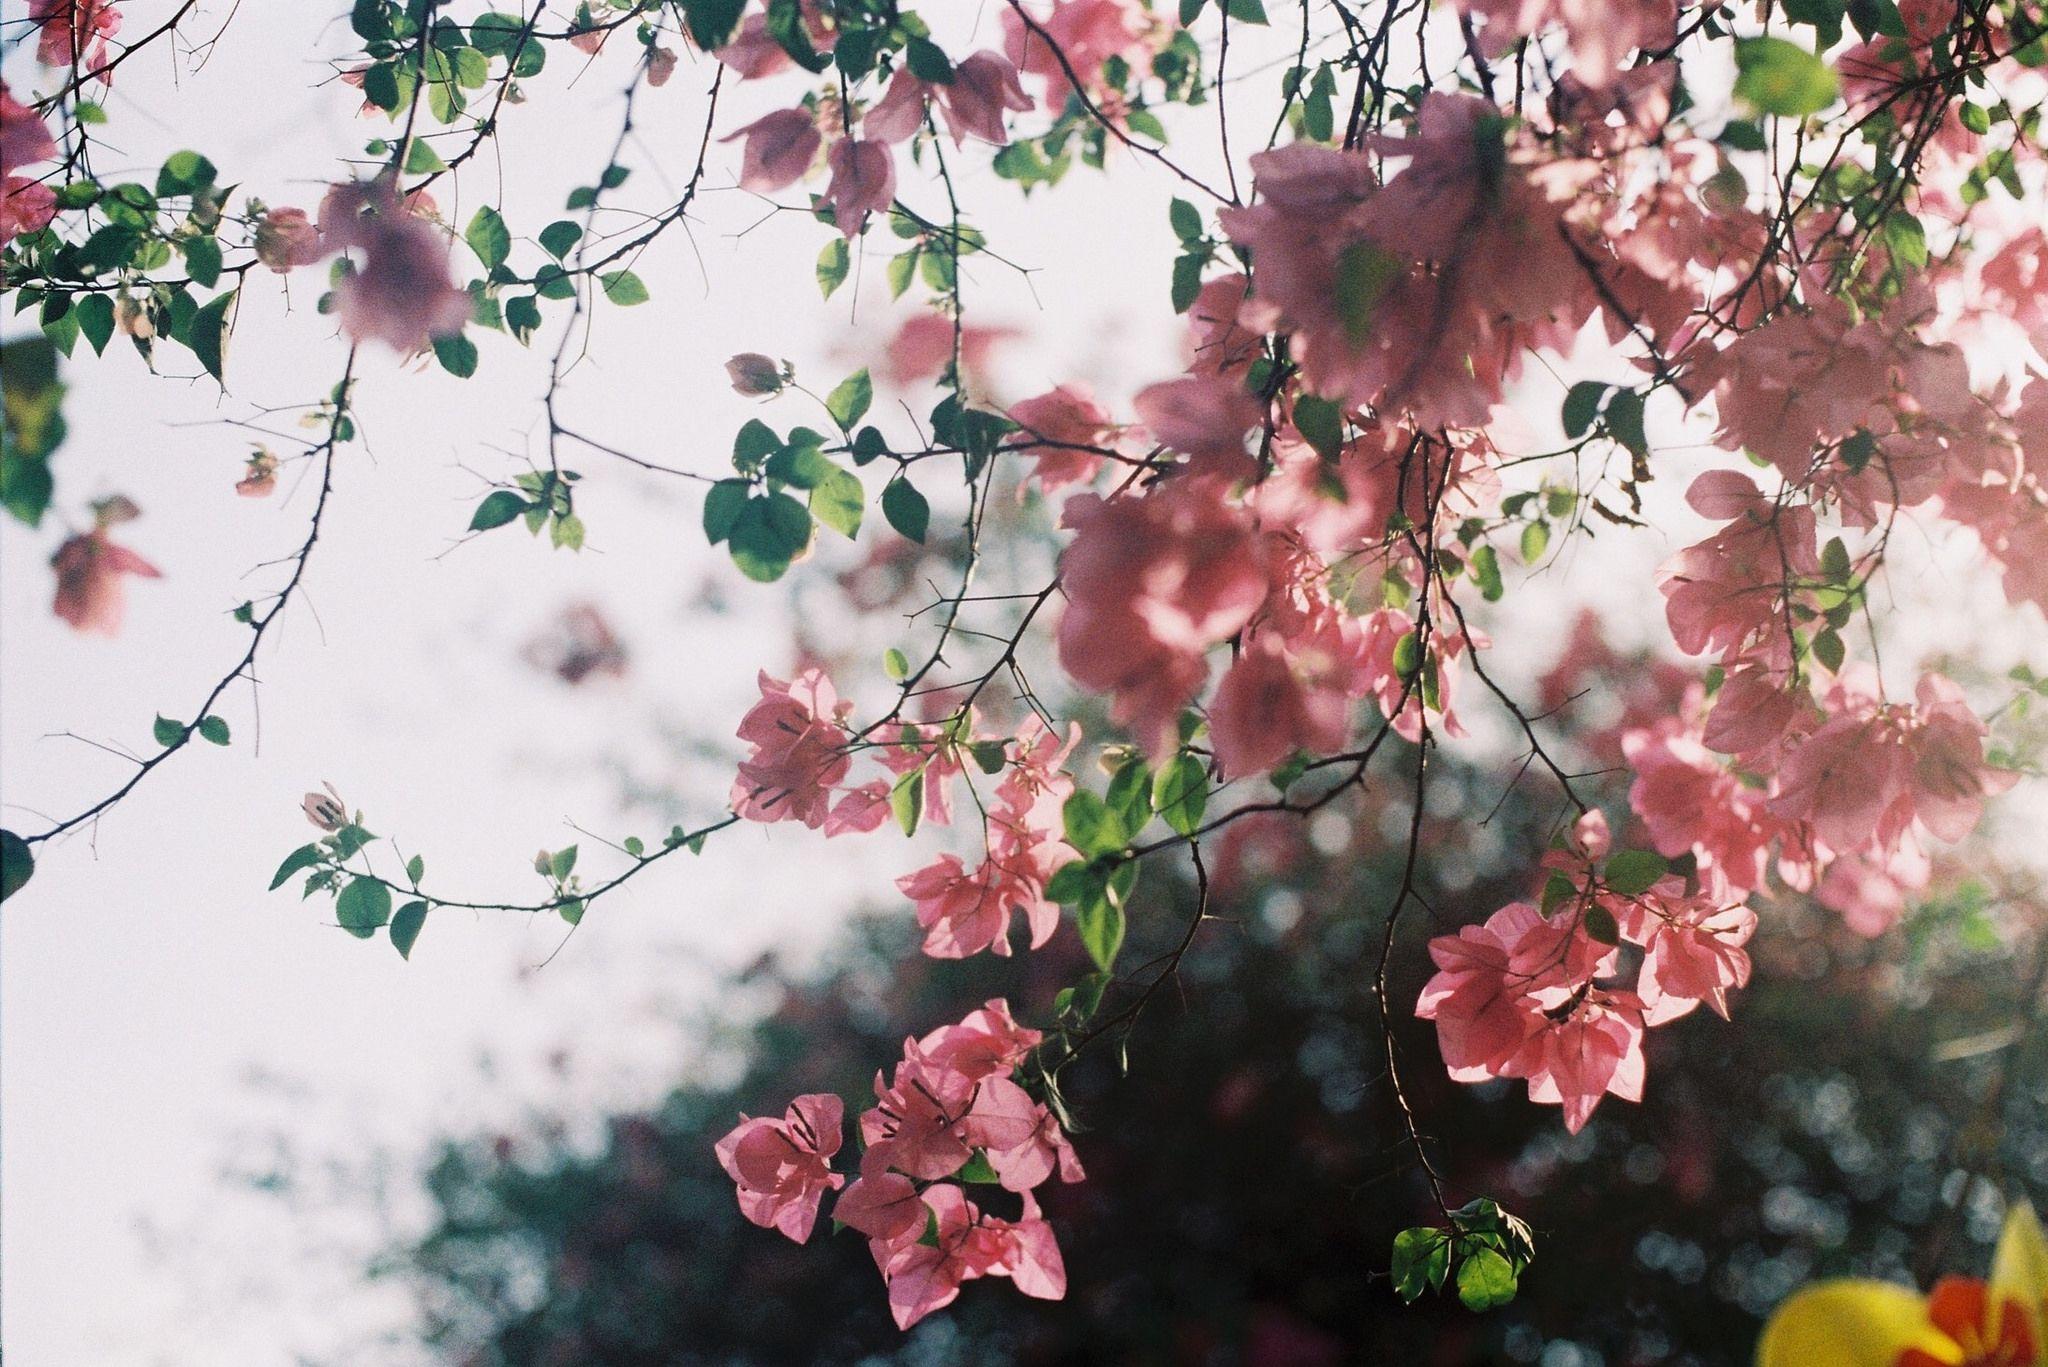 Pin By M M A I On Floww Plants Pretty Flowers Planting Flowers